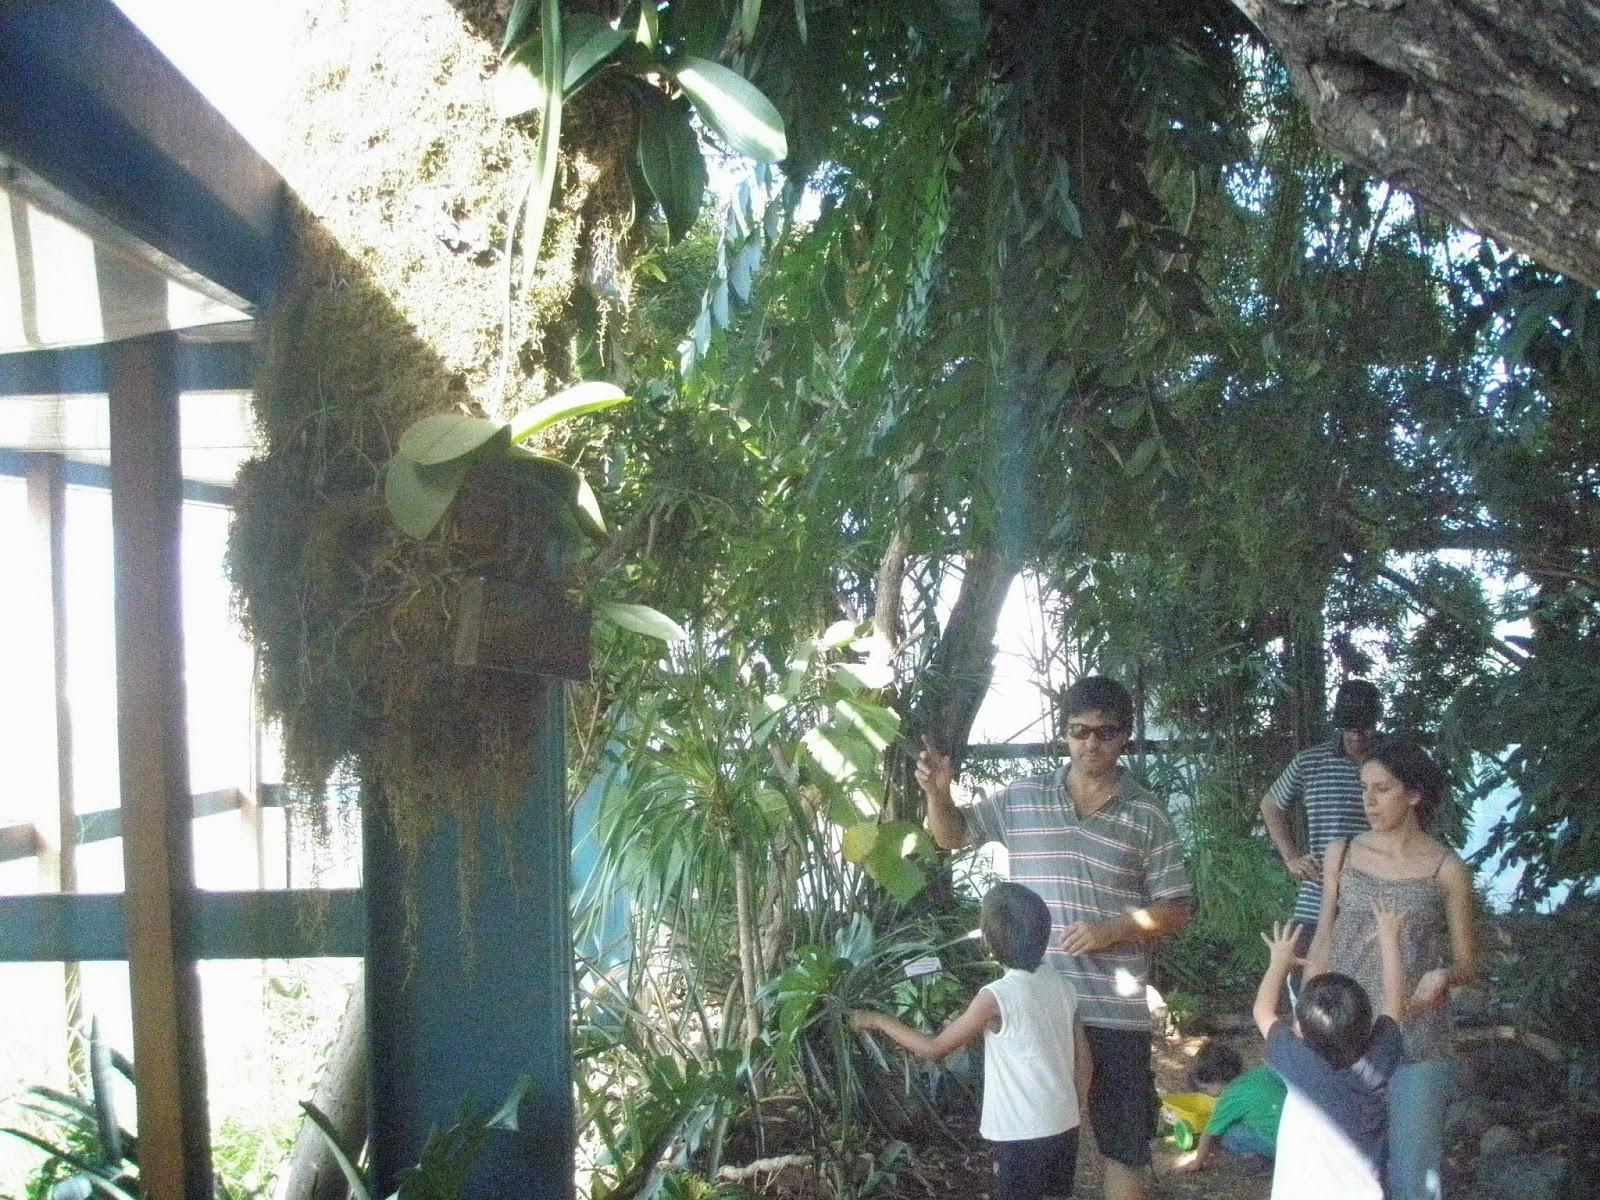 Jard n bot nico de c rdoba actividades 2013 for Actividades jardin botanico 2016